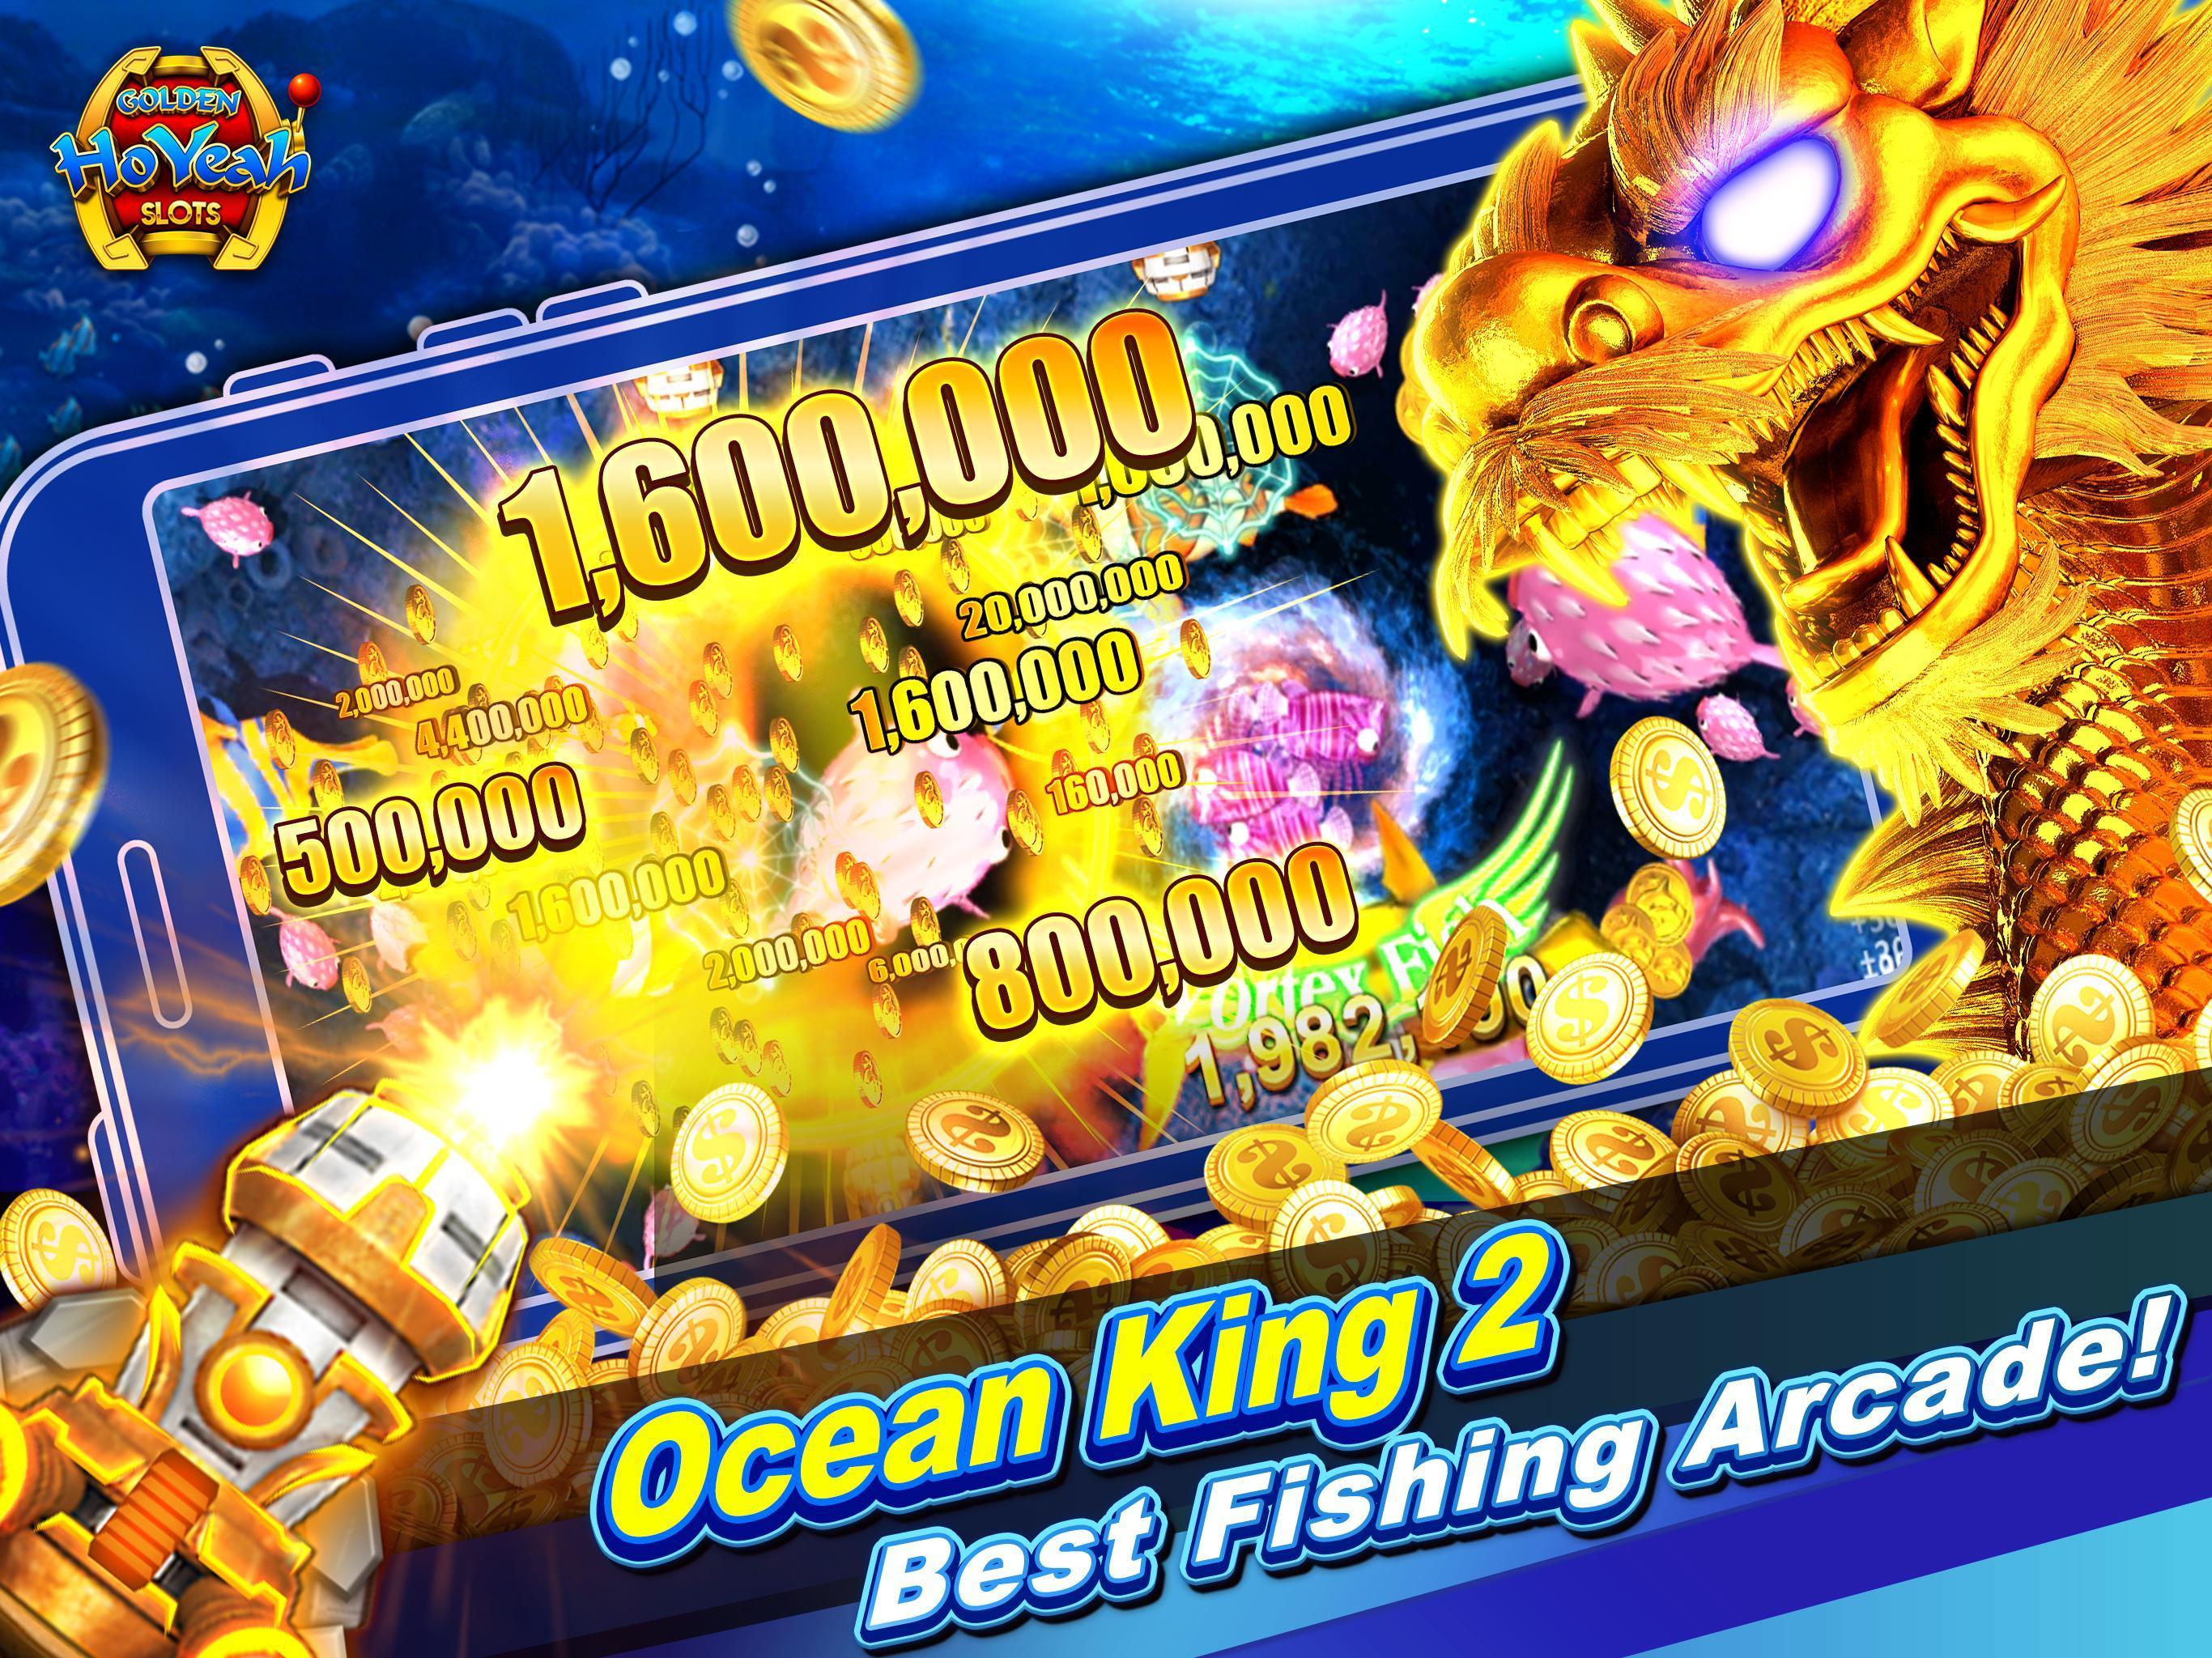 Slots (Golden HoYeah) - Casino Slots 2.5.7 Screenshot 3